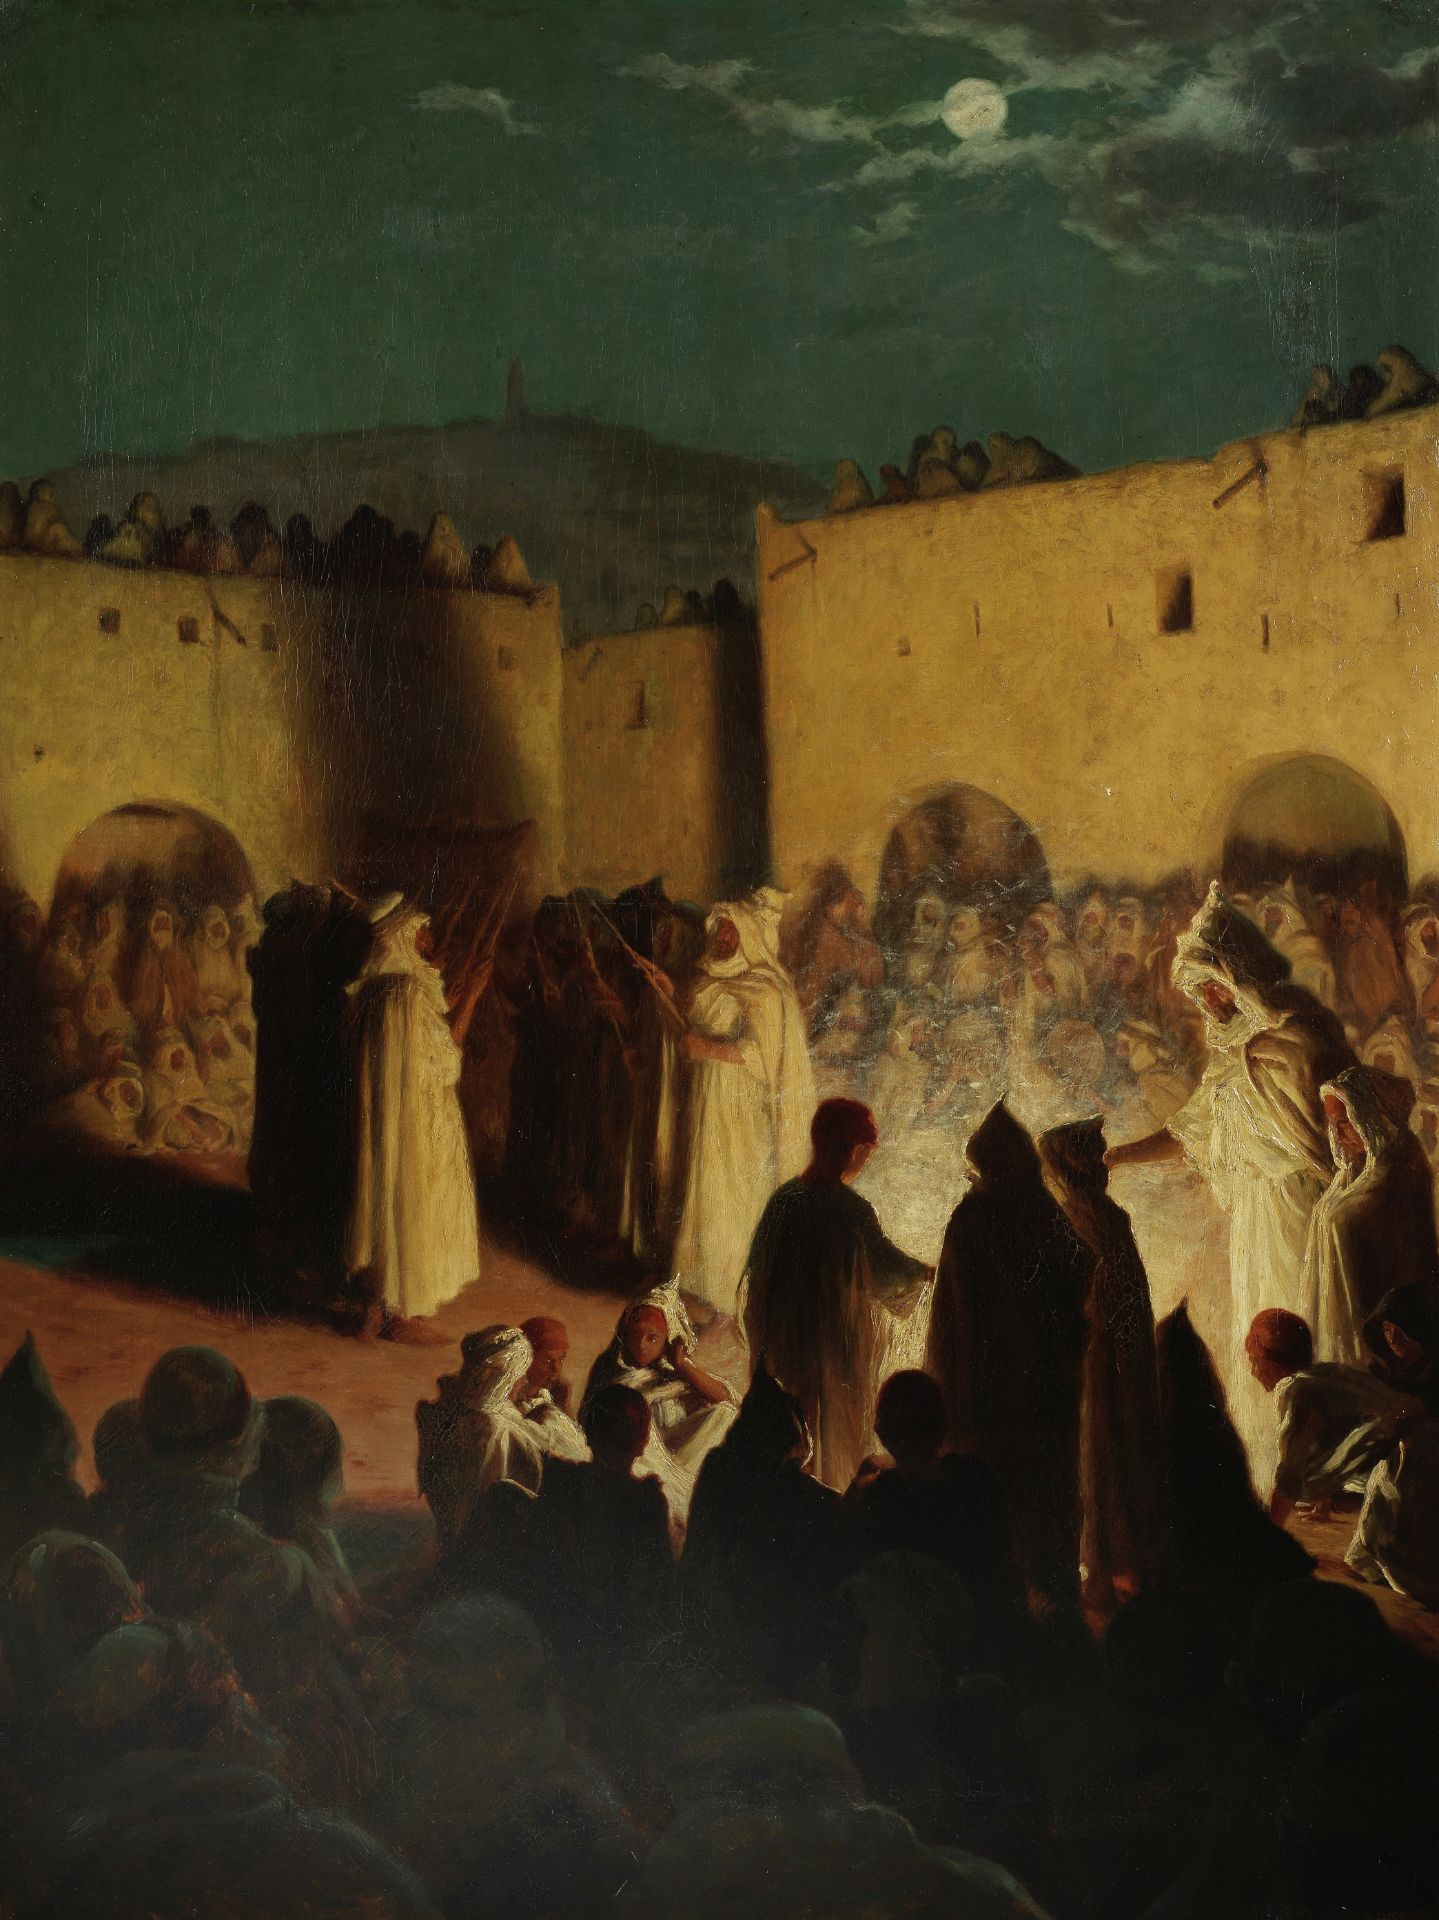 Thomas Frederick Mason Sheard (British, 1866-1921) A night celebration of a Muslim Eid